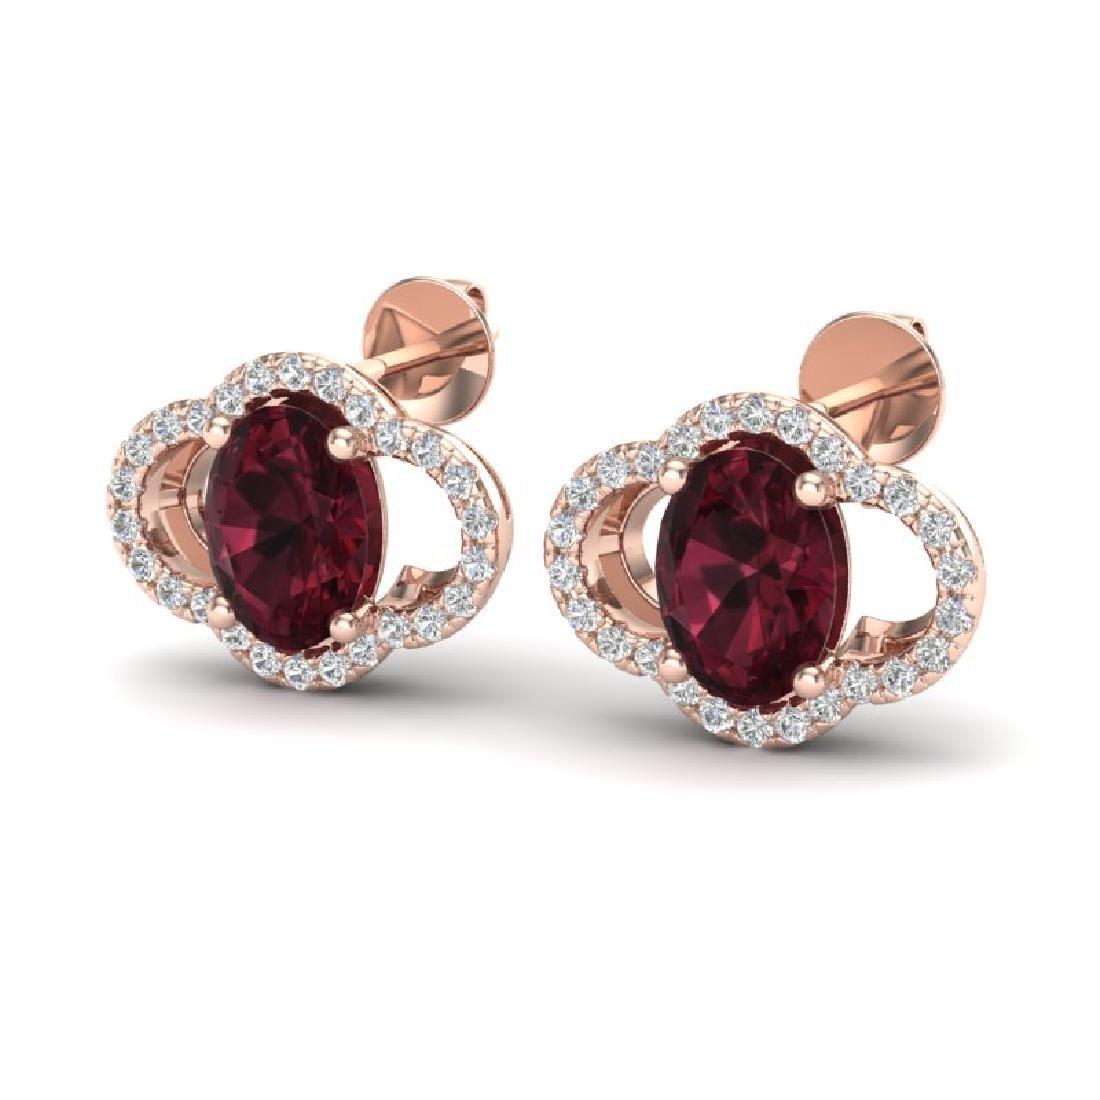 4 CTW Garnet & Micro Pave VS/SI Diamond Earrings 10K